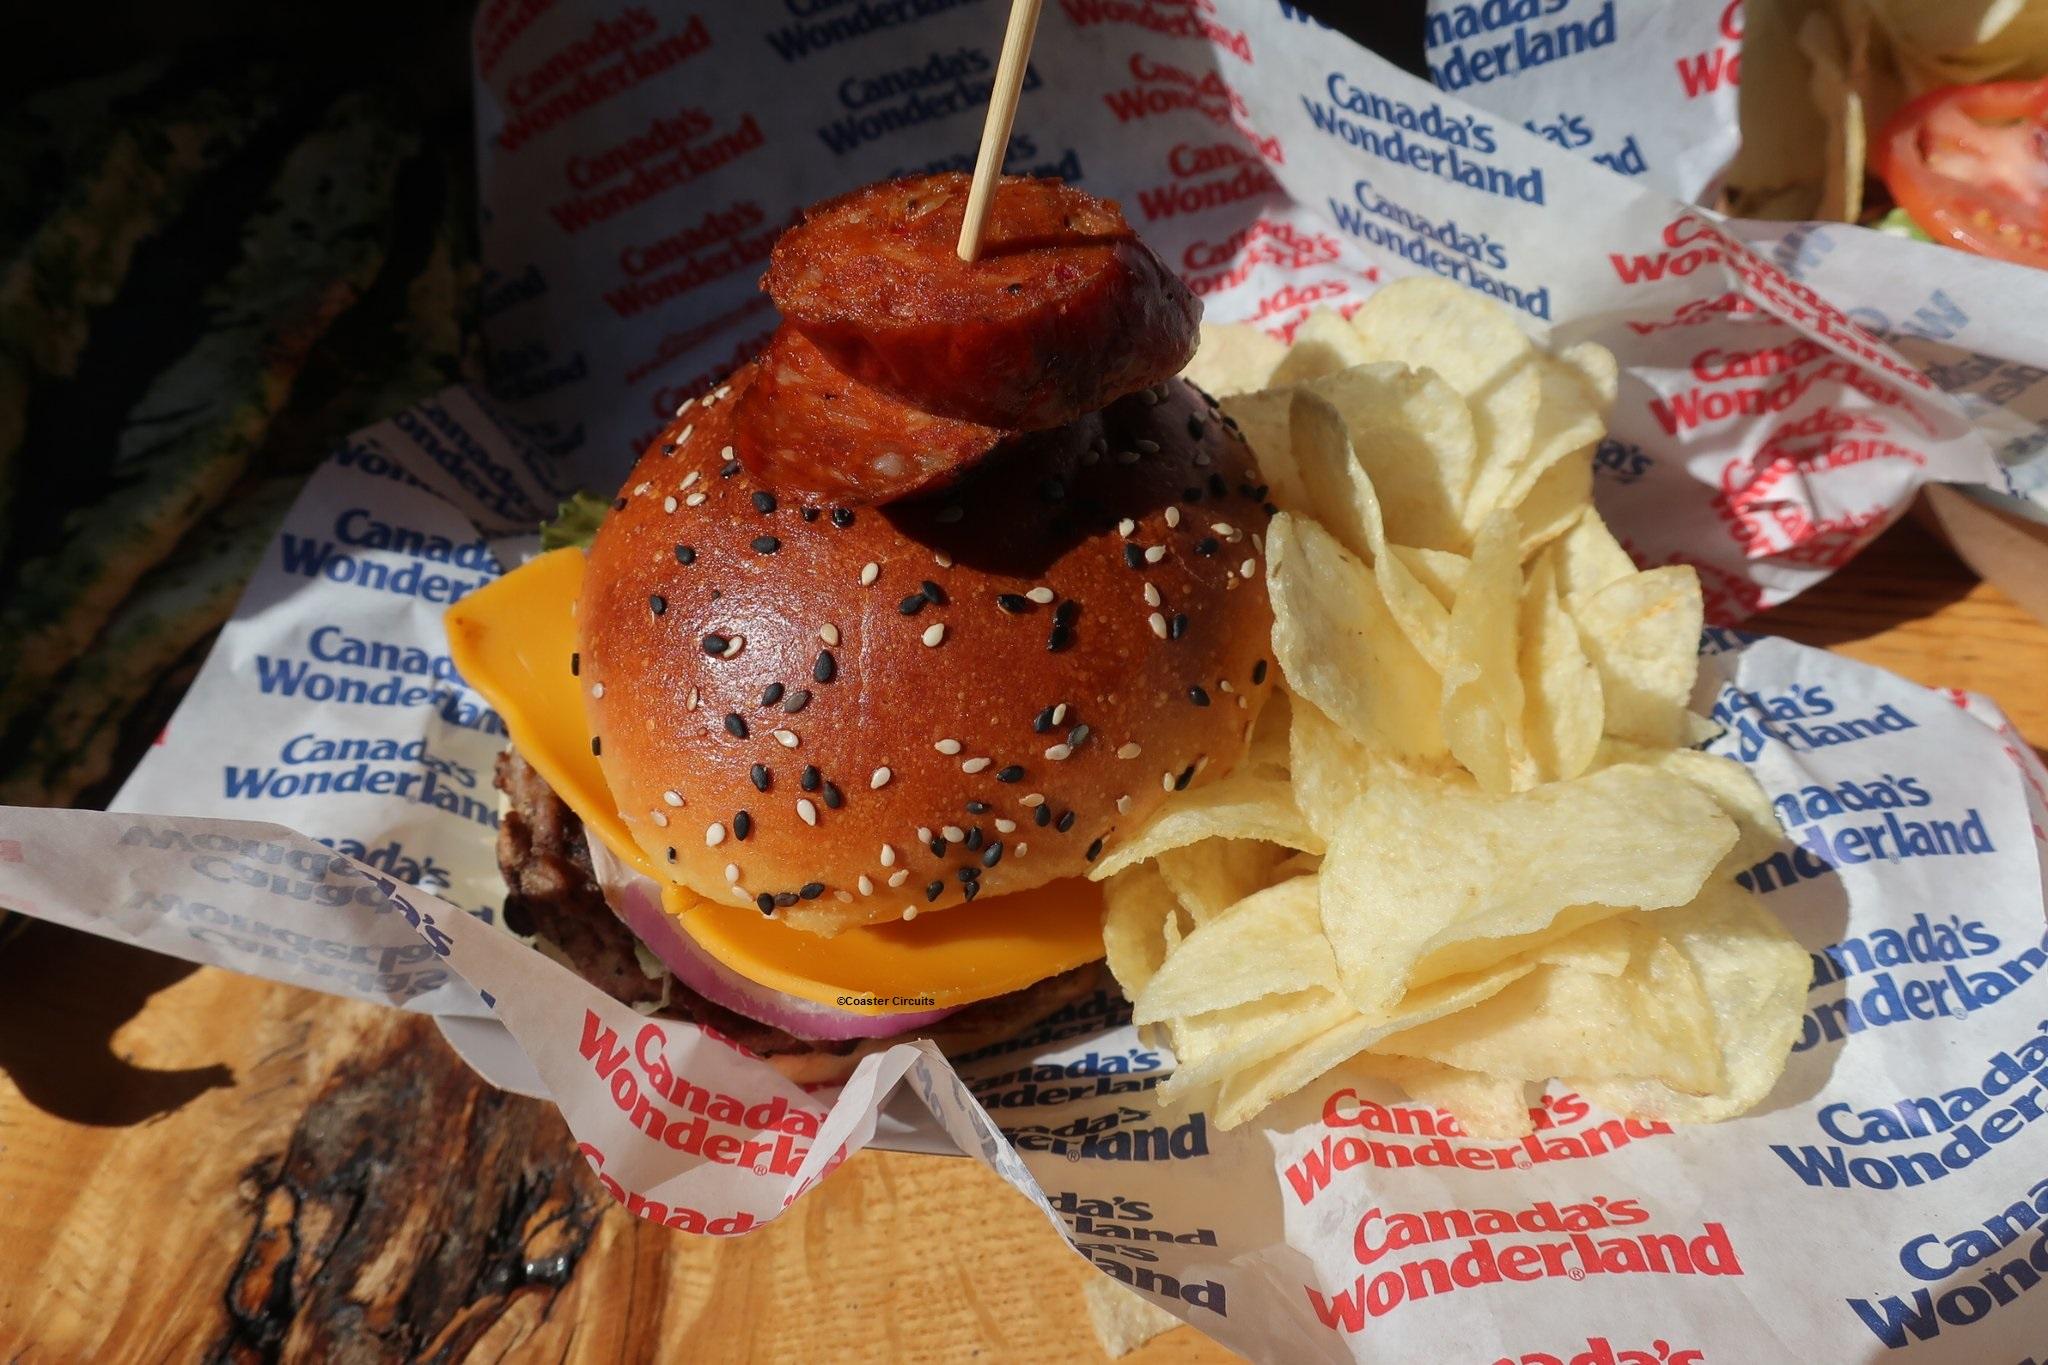 170930 Canada's Wonderland Haunt Muskoka Axe Murderer Burger ©Coaster Circuits